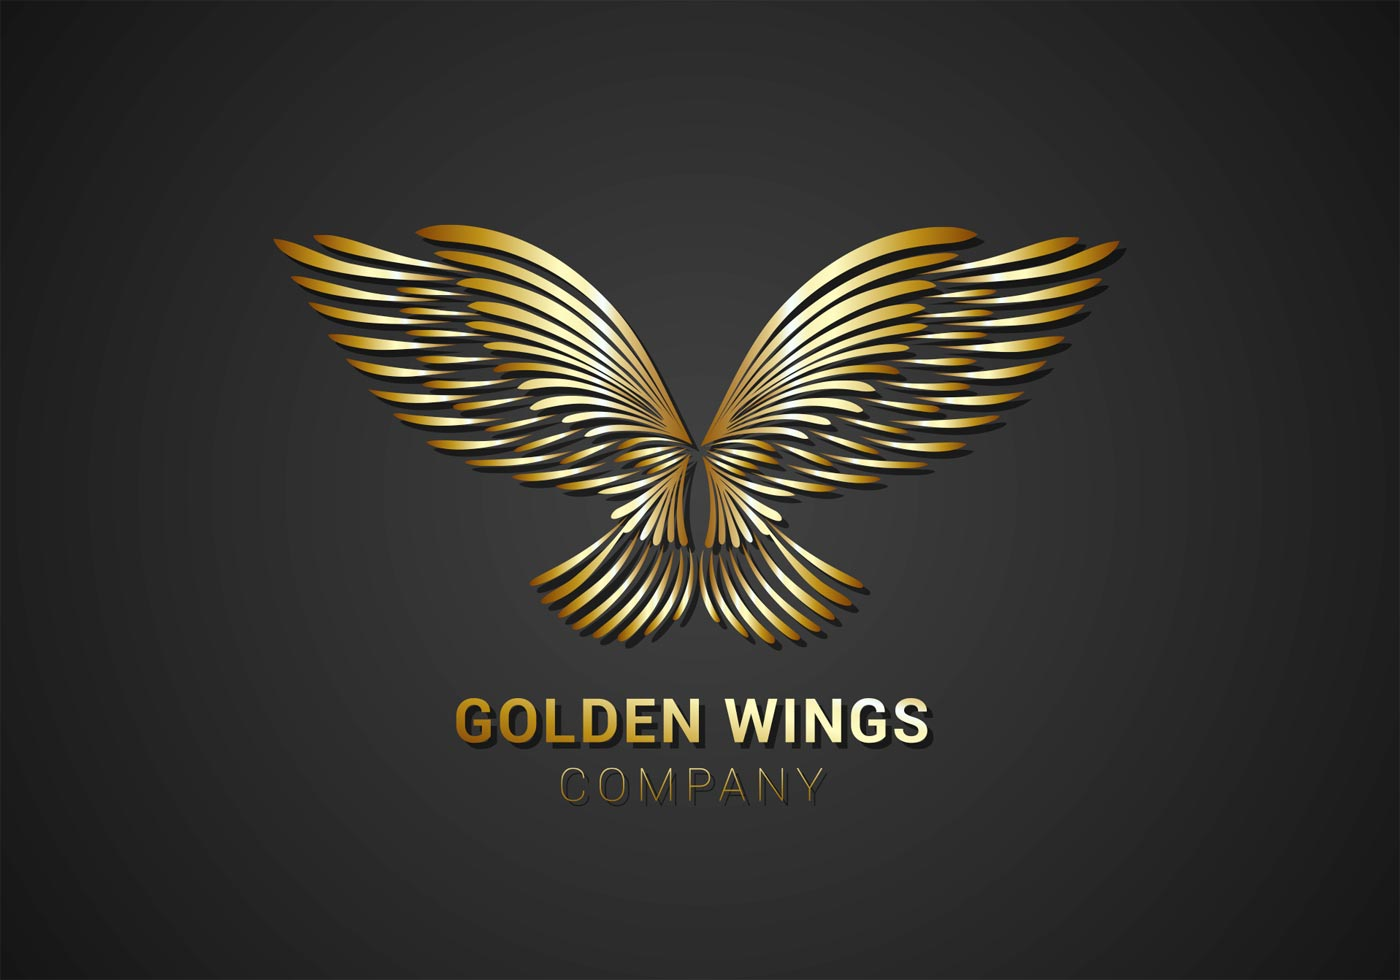 Supernatural Iphone Wallpaper Golden Wings Logo Vector Download Free Vector Art Stock